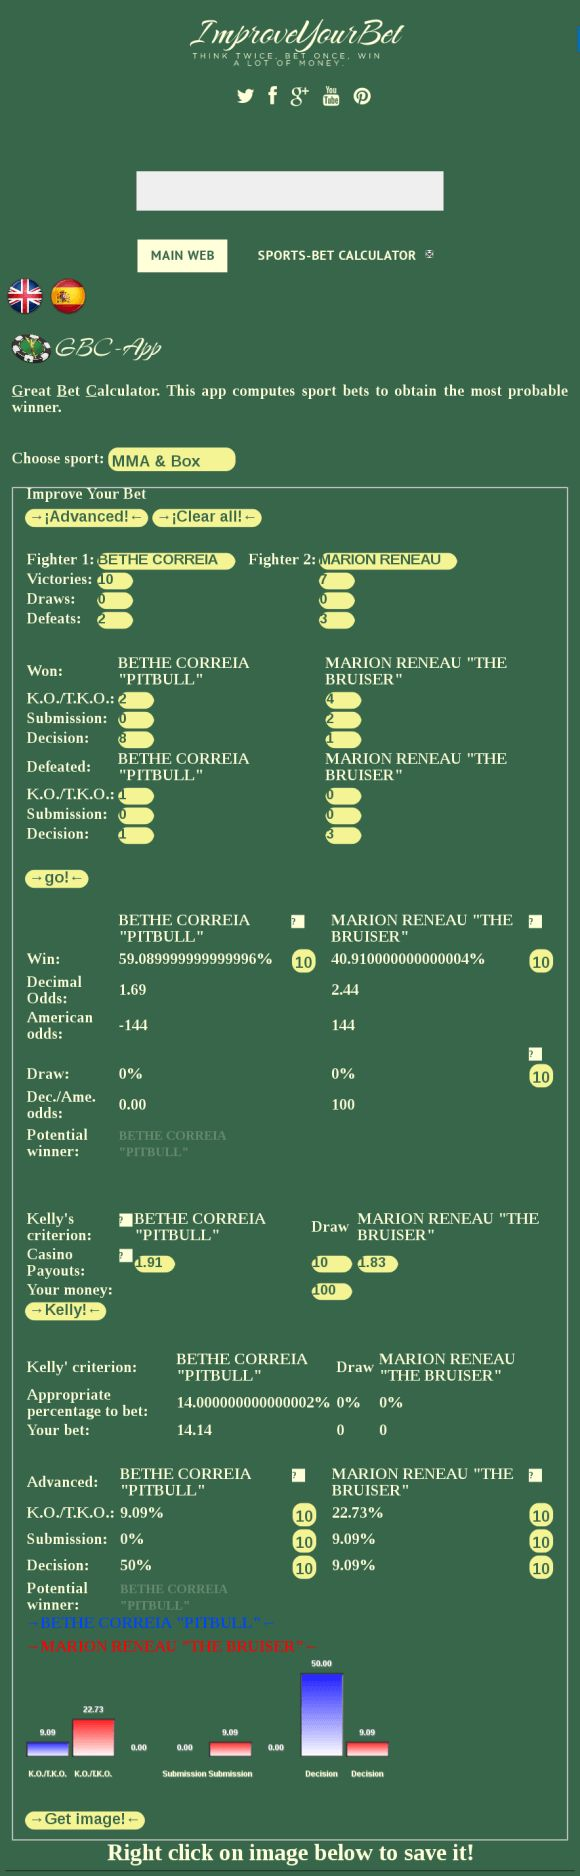 UFC fight night 106 forecast predictions and picks BETHE CORREIA PITBULL Vs MARION RENEAU THE BRUISER